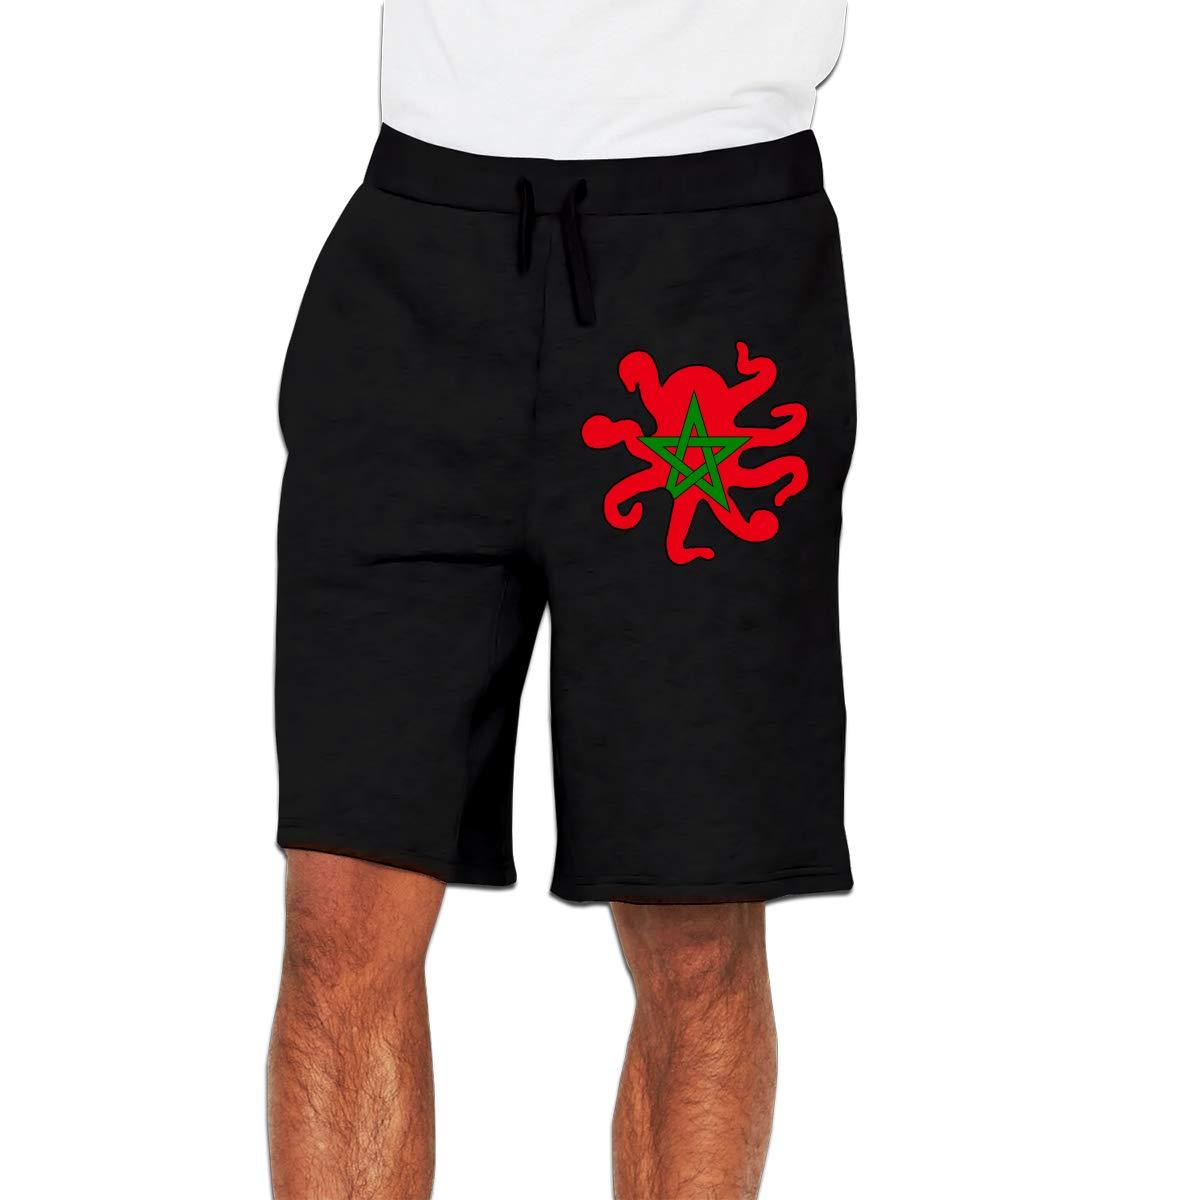 Yecx-1 Mens Octopus Shaped Morocco Flag Jogger Shorts Bodybuilding Short